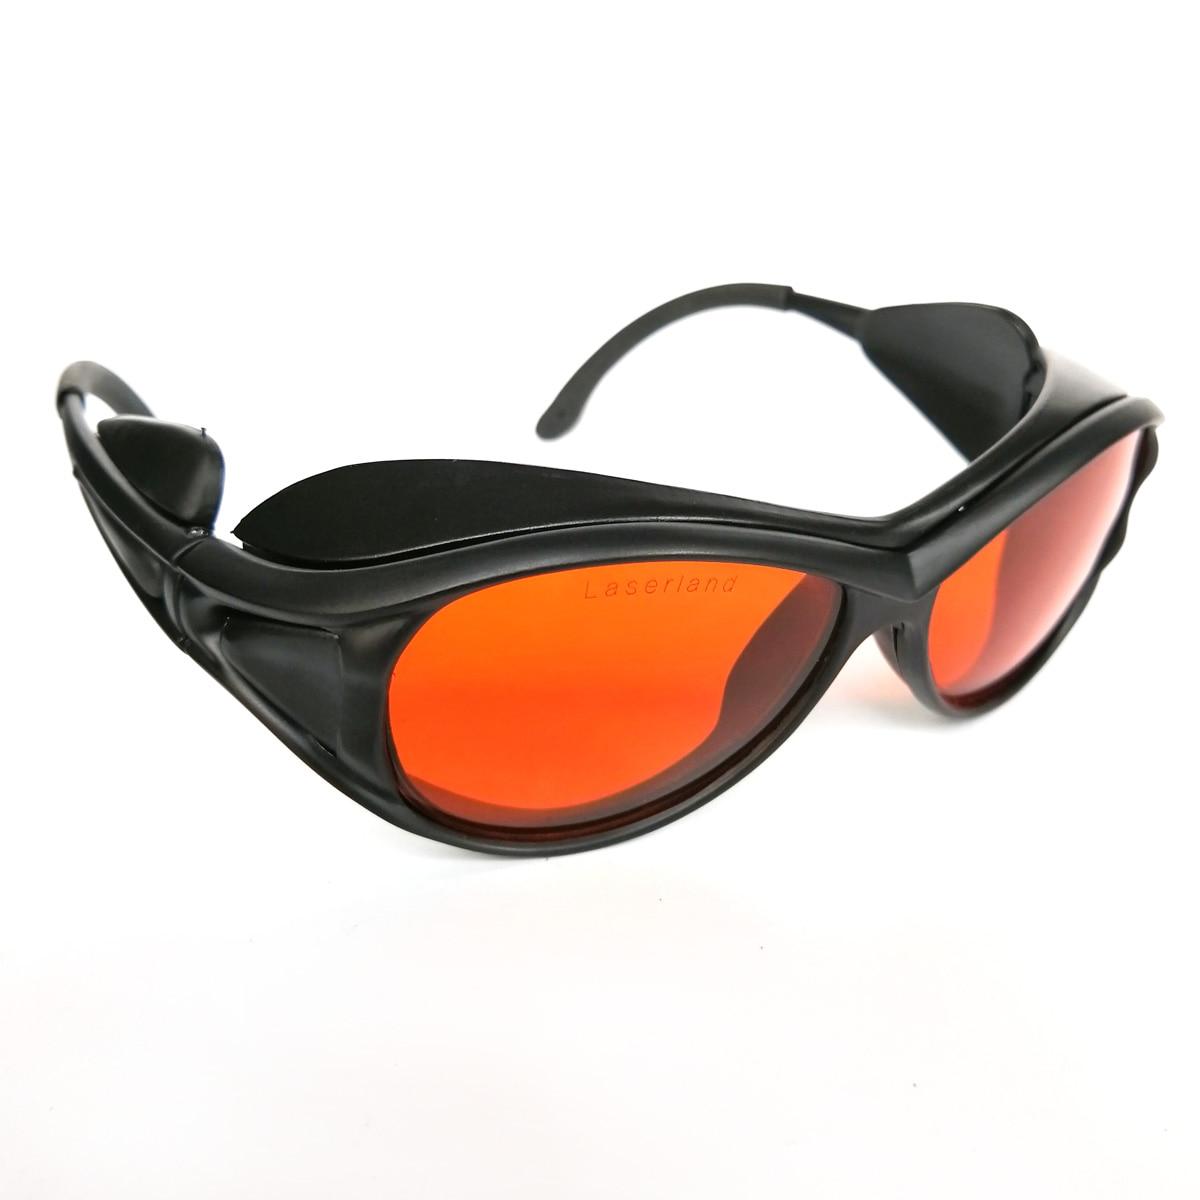 OD4+ UV OD5+ 190-540nm Green Blue Safety Laser Glasses Protective CE T1-2